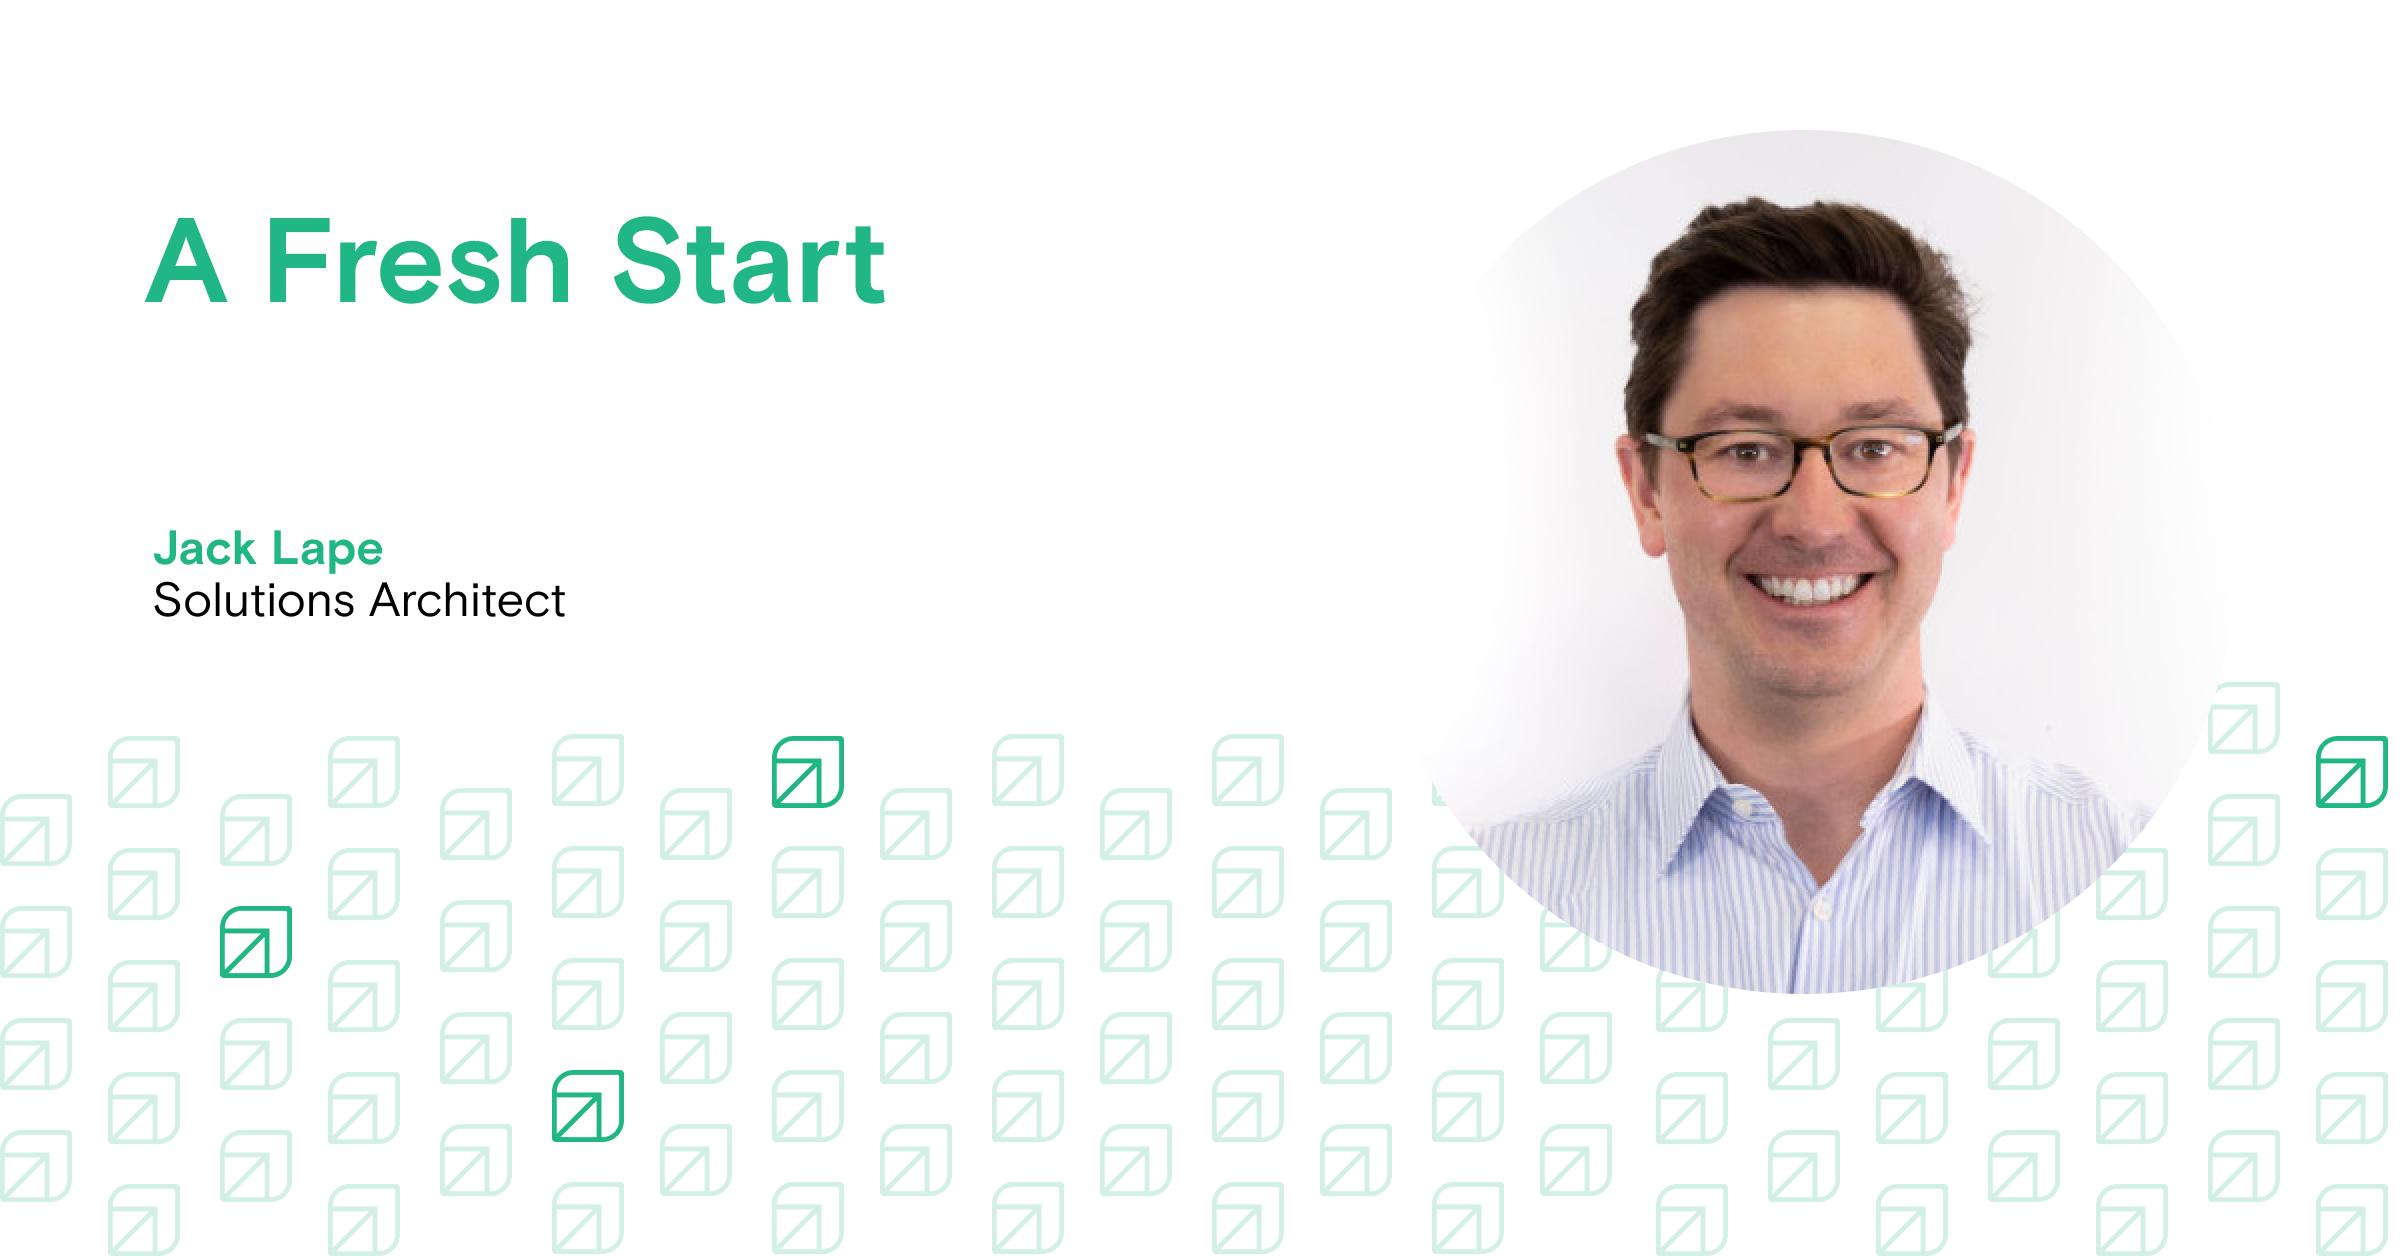 A Fresh Start: Jack, Solutions Architect